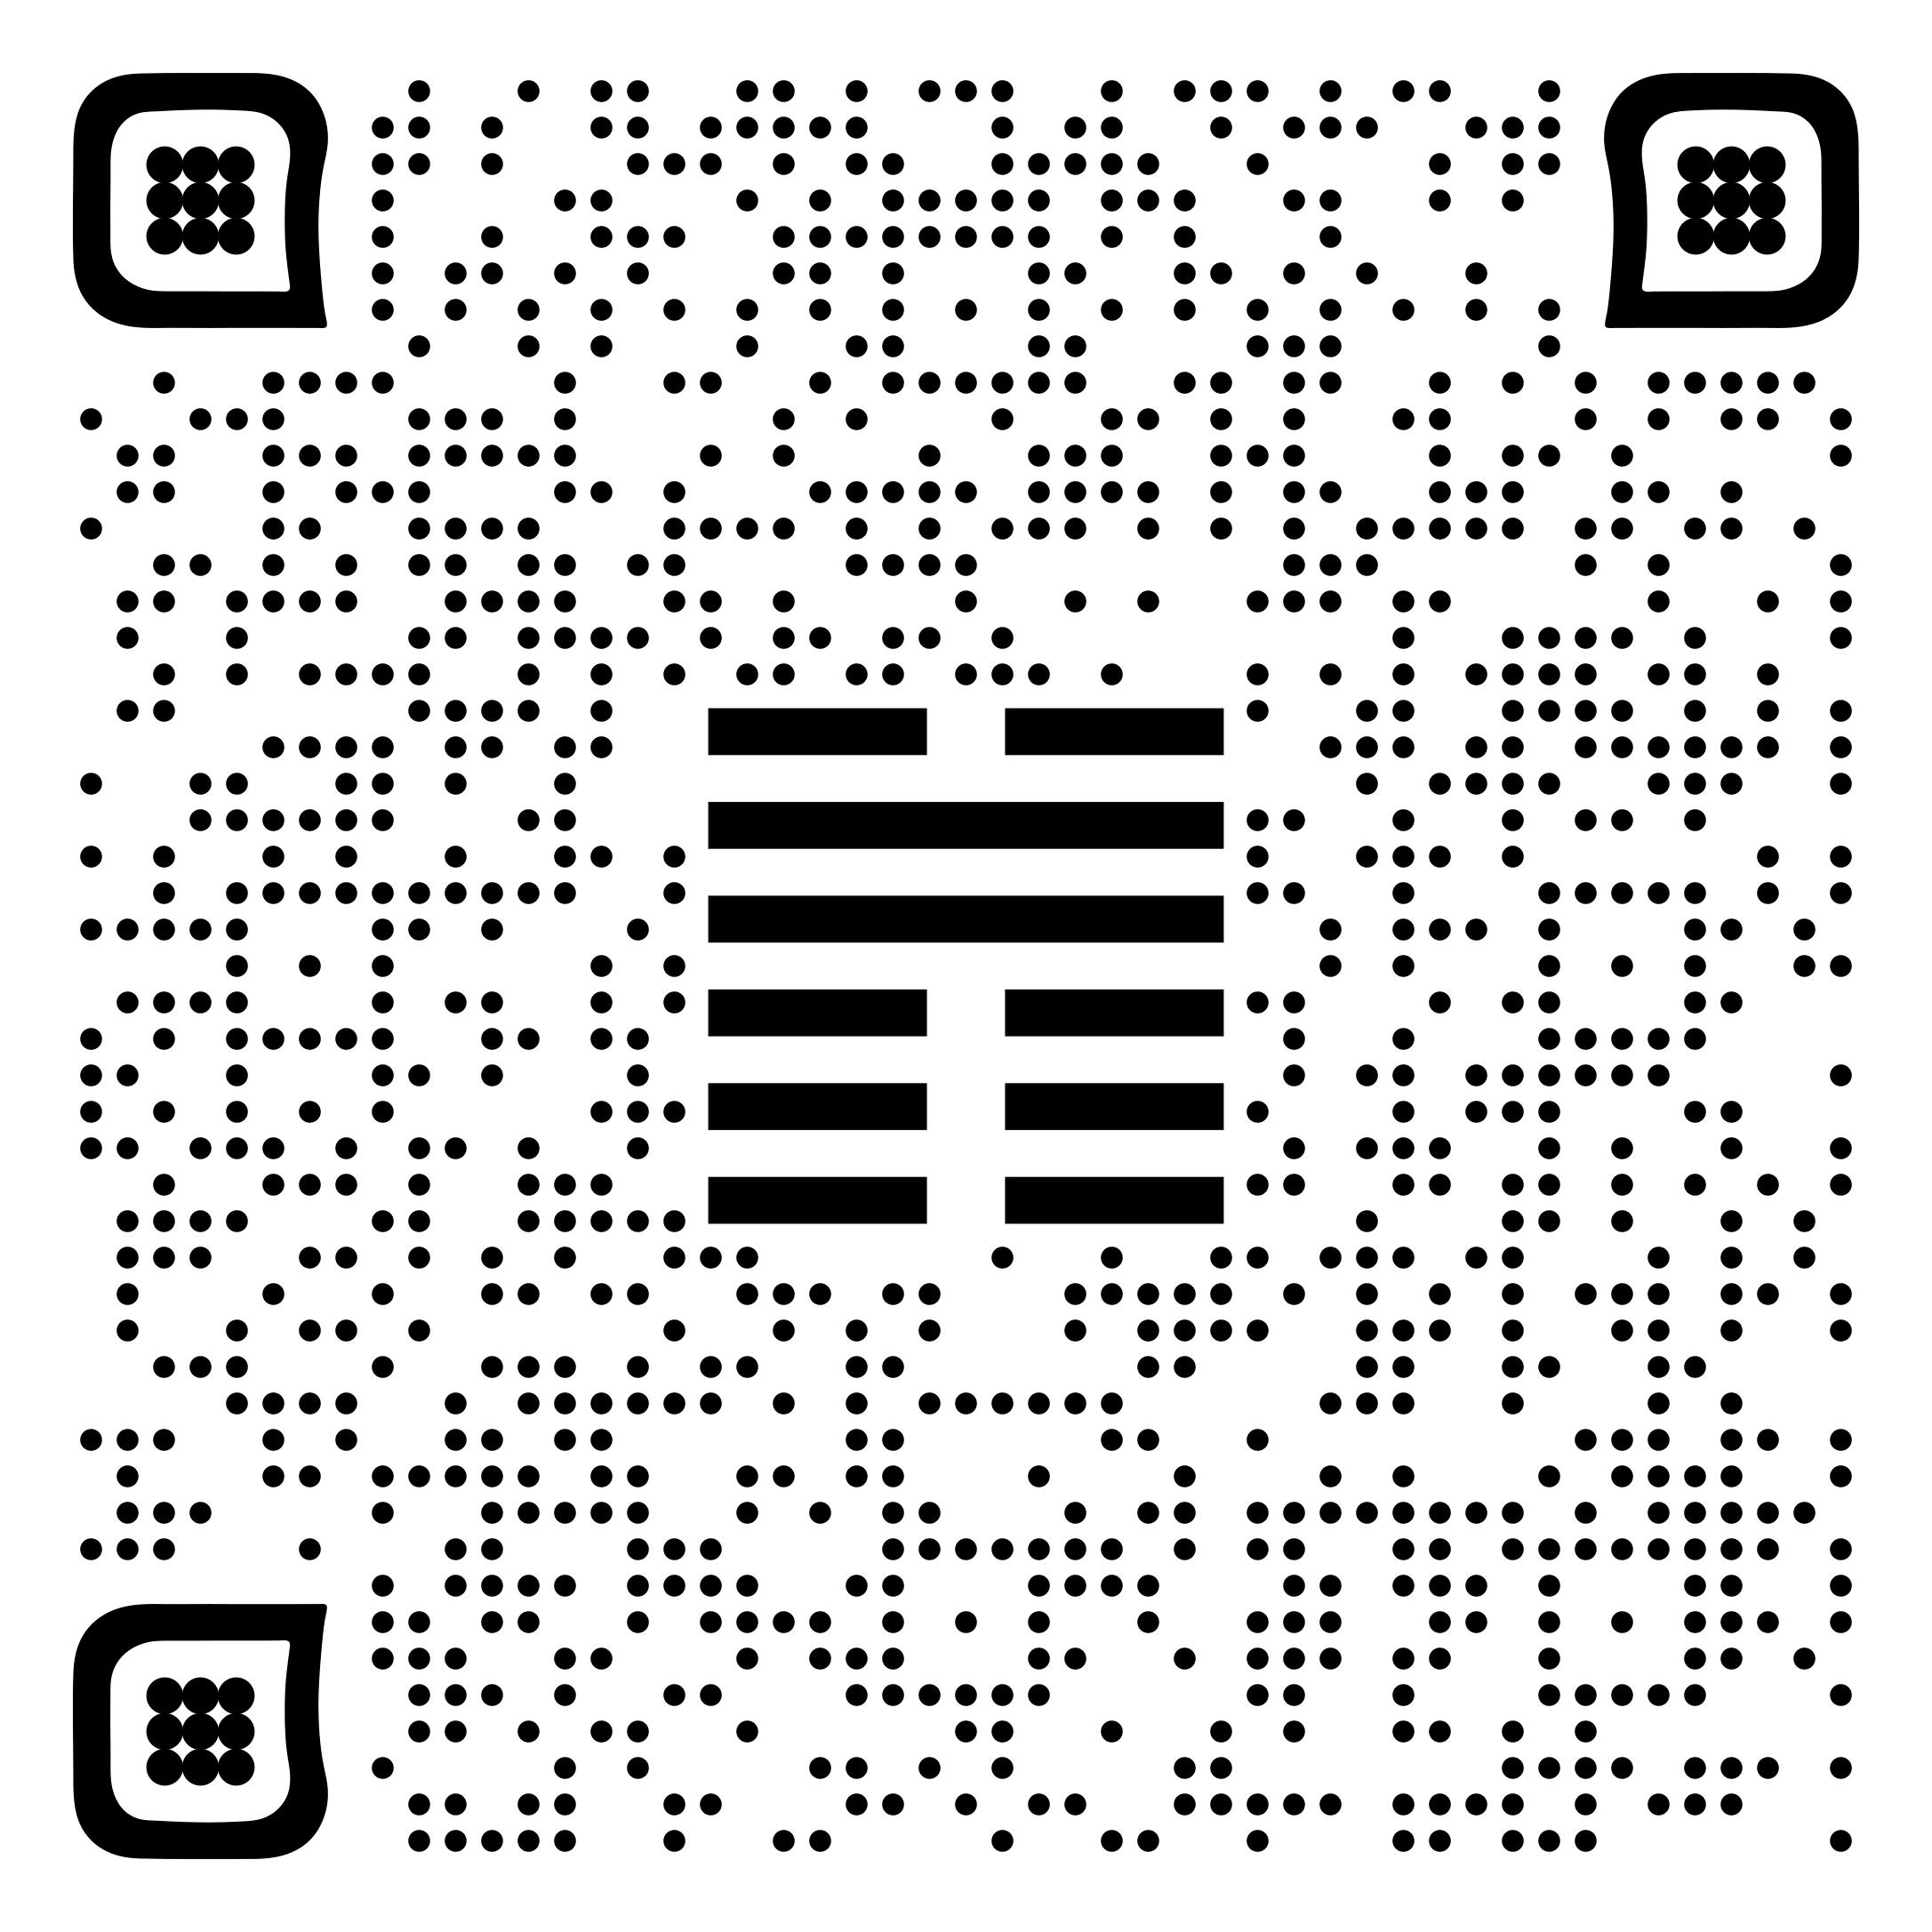 qr-code-45.png